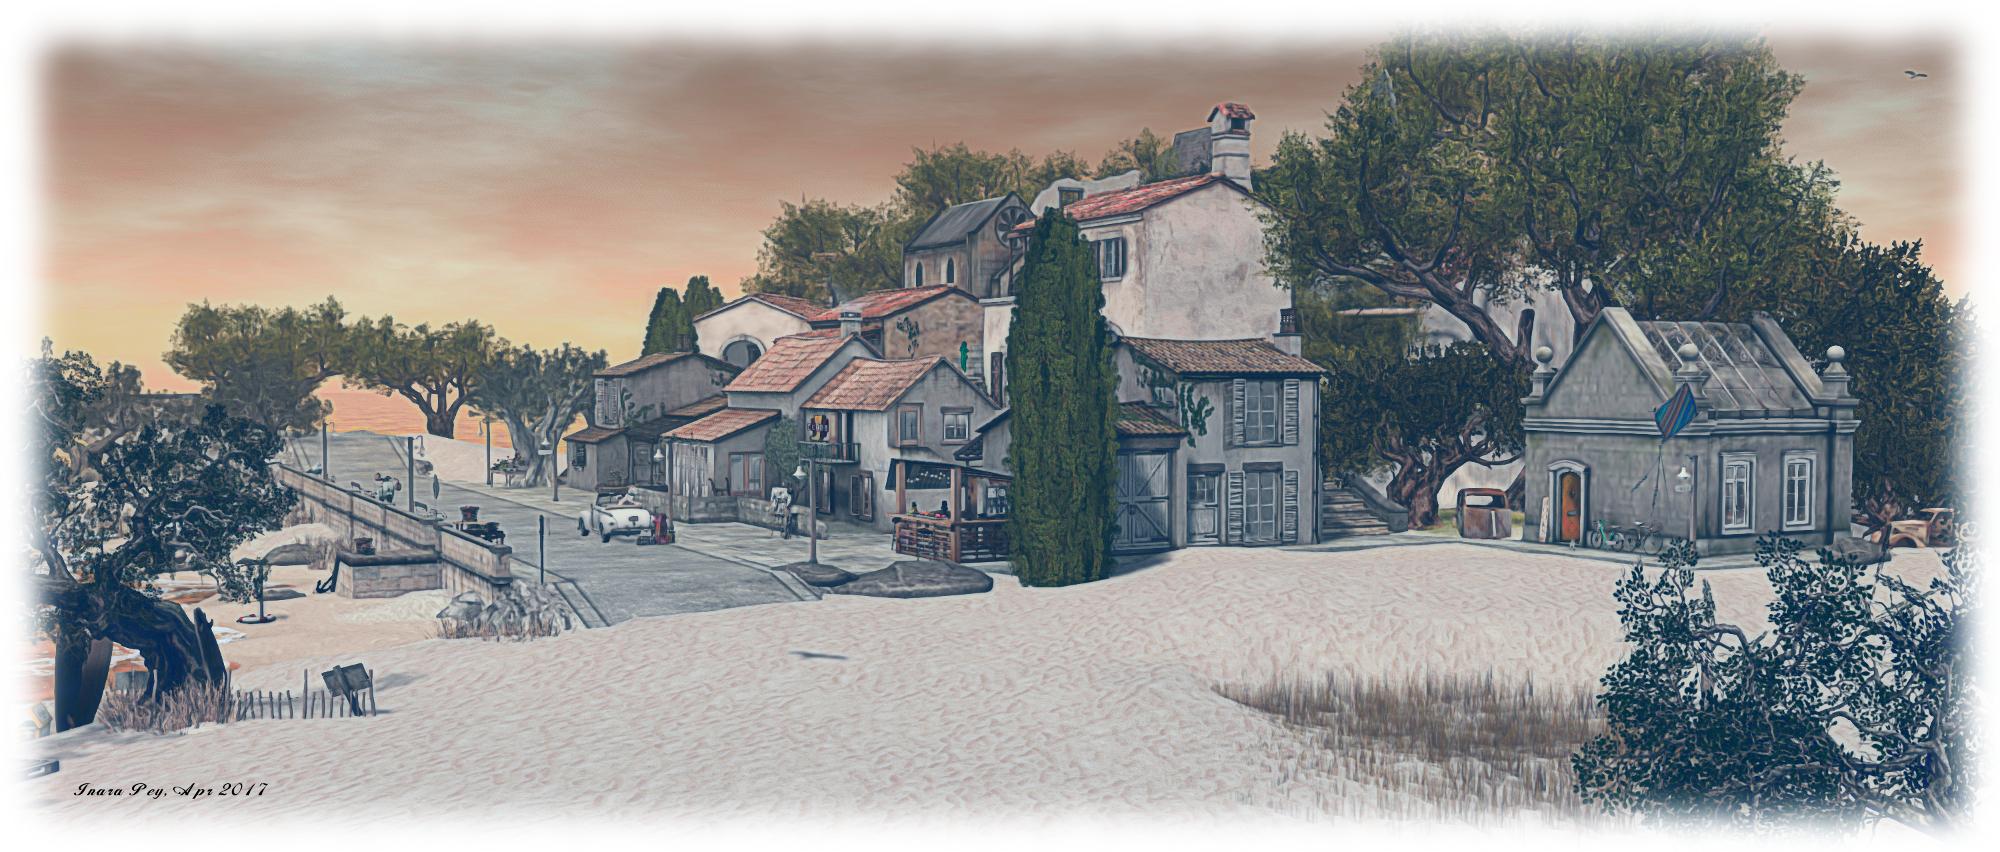 Maison de lamitie in second life